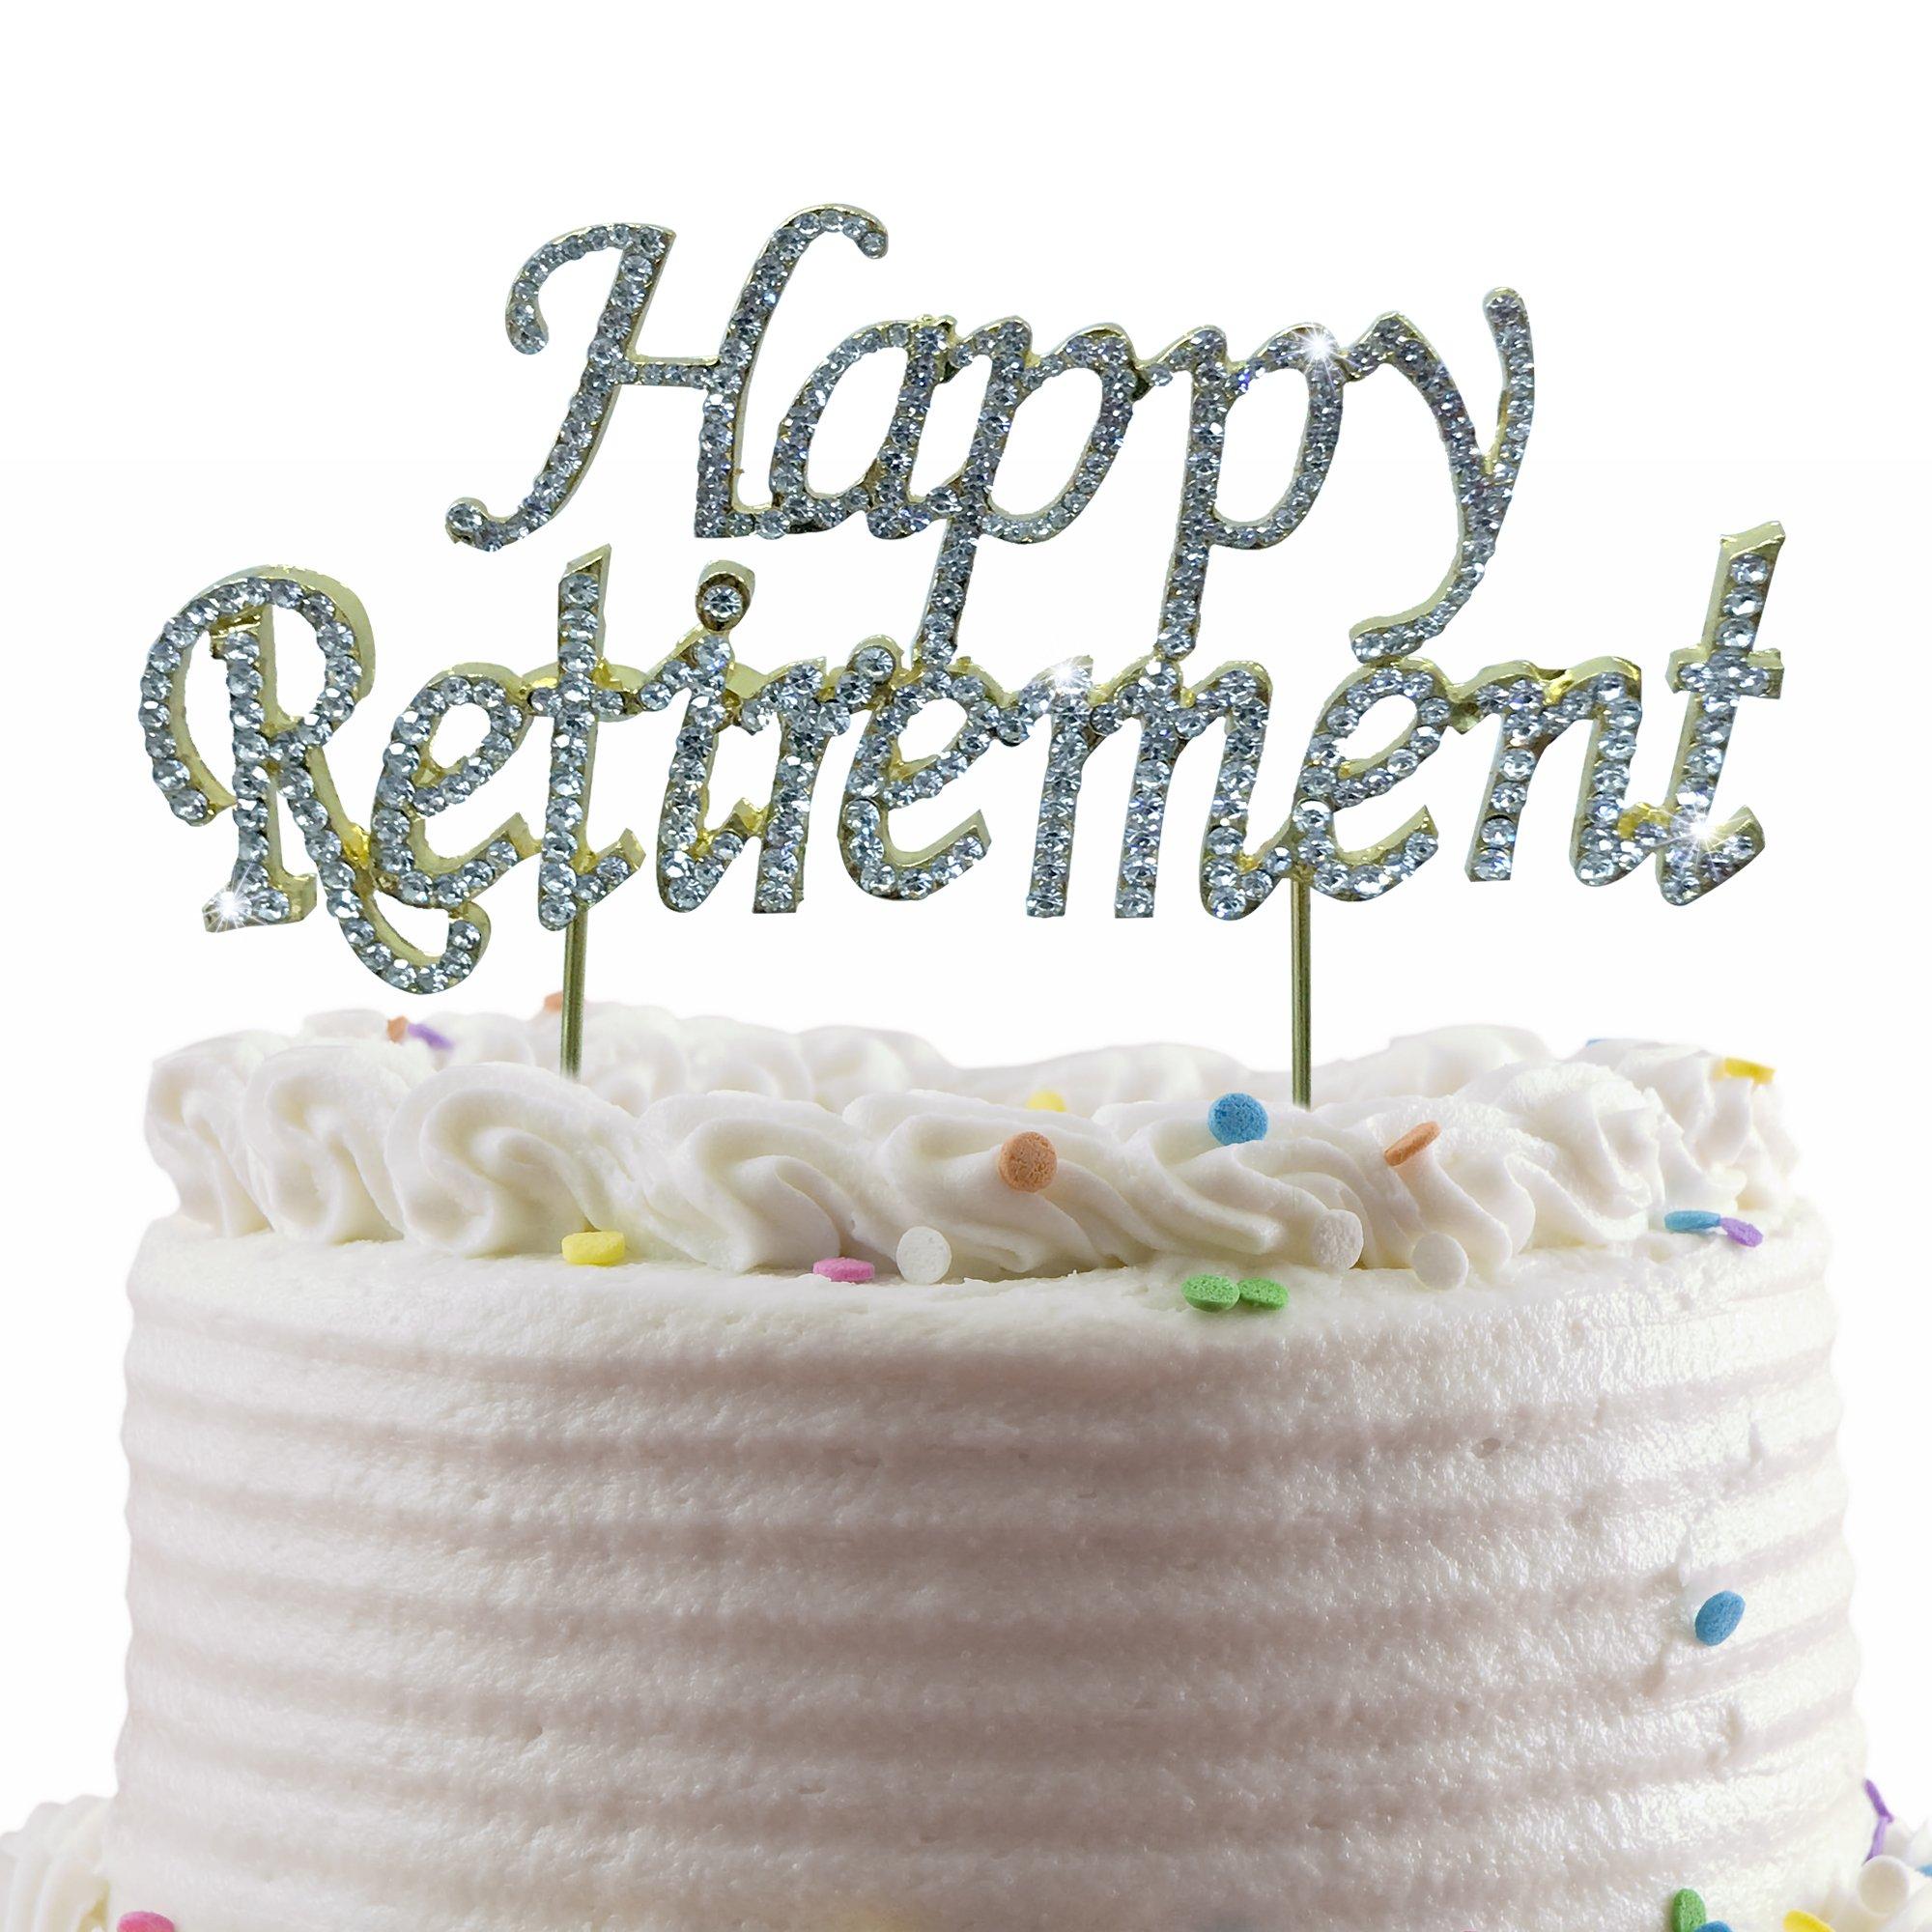 JennyGems Happy Retirement Cake Topper - Sparkling Rhinestones With Gold Trim - Retirement Party Decoration